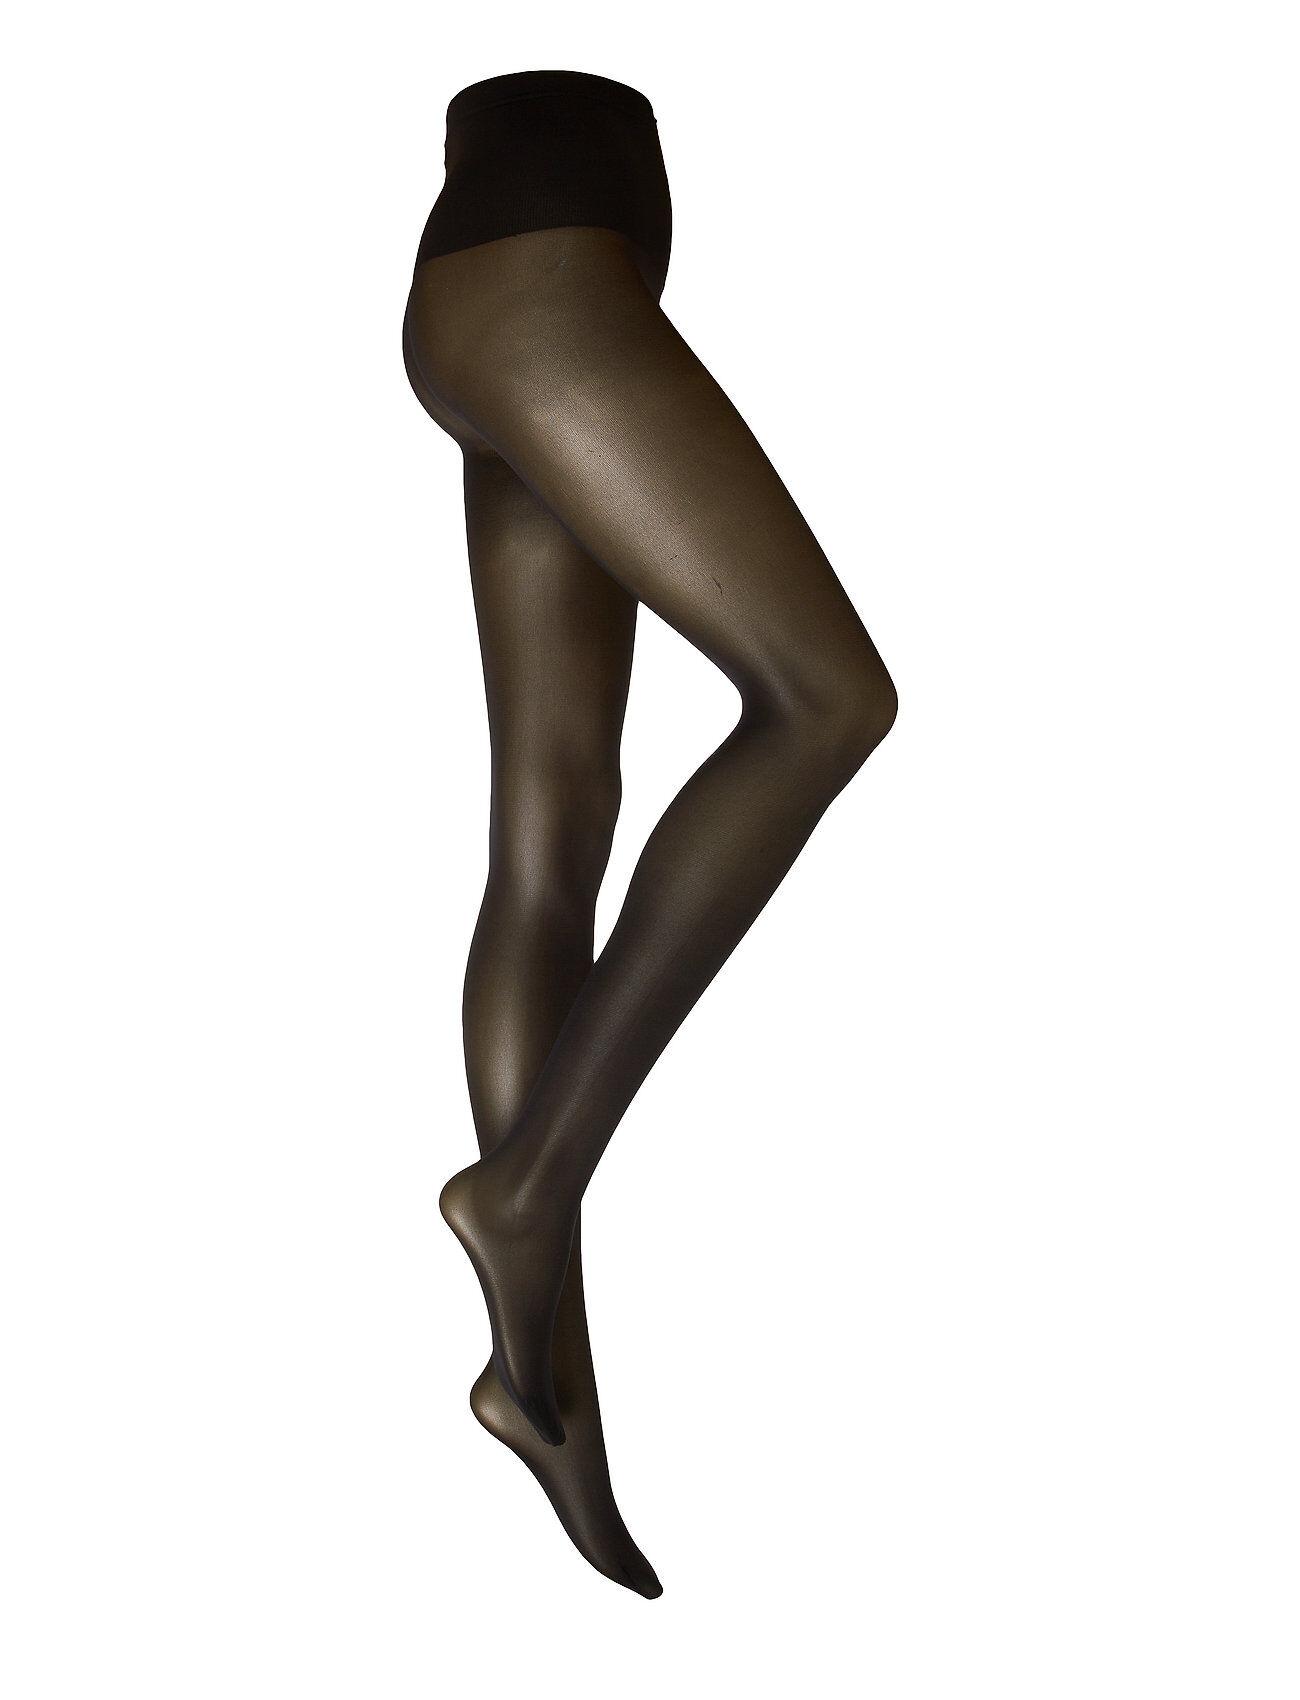 Swedish Stockings Svea Premium Tights 30d Sukkahousut Musta Swedish Stockings